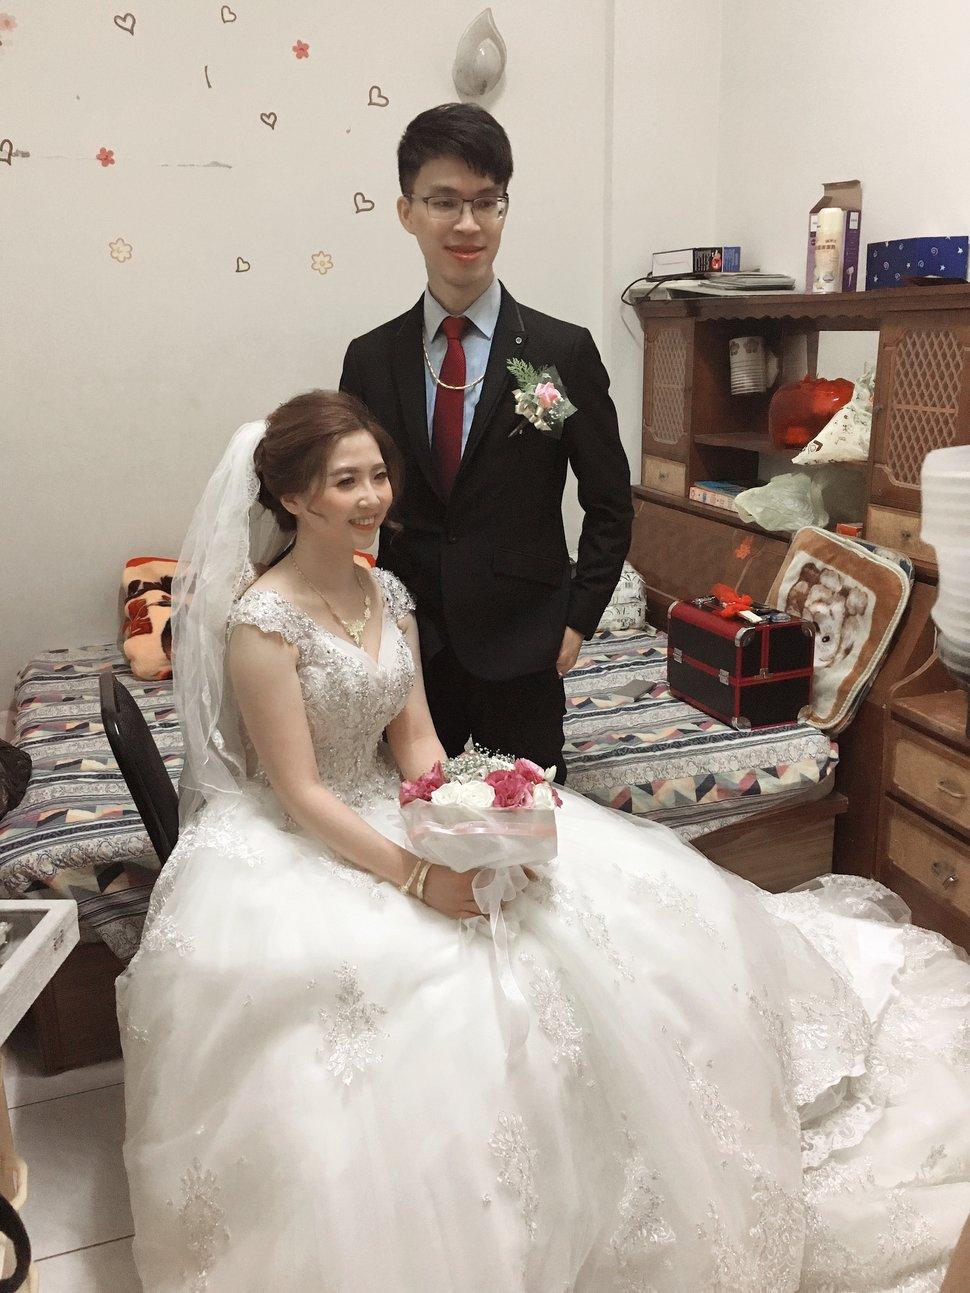 E6C375A0-B0F0-4C22-9581-A18557335856 - Winnie Liu白色時尚城堡《結婚吧》